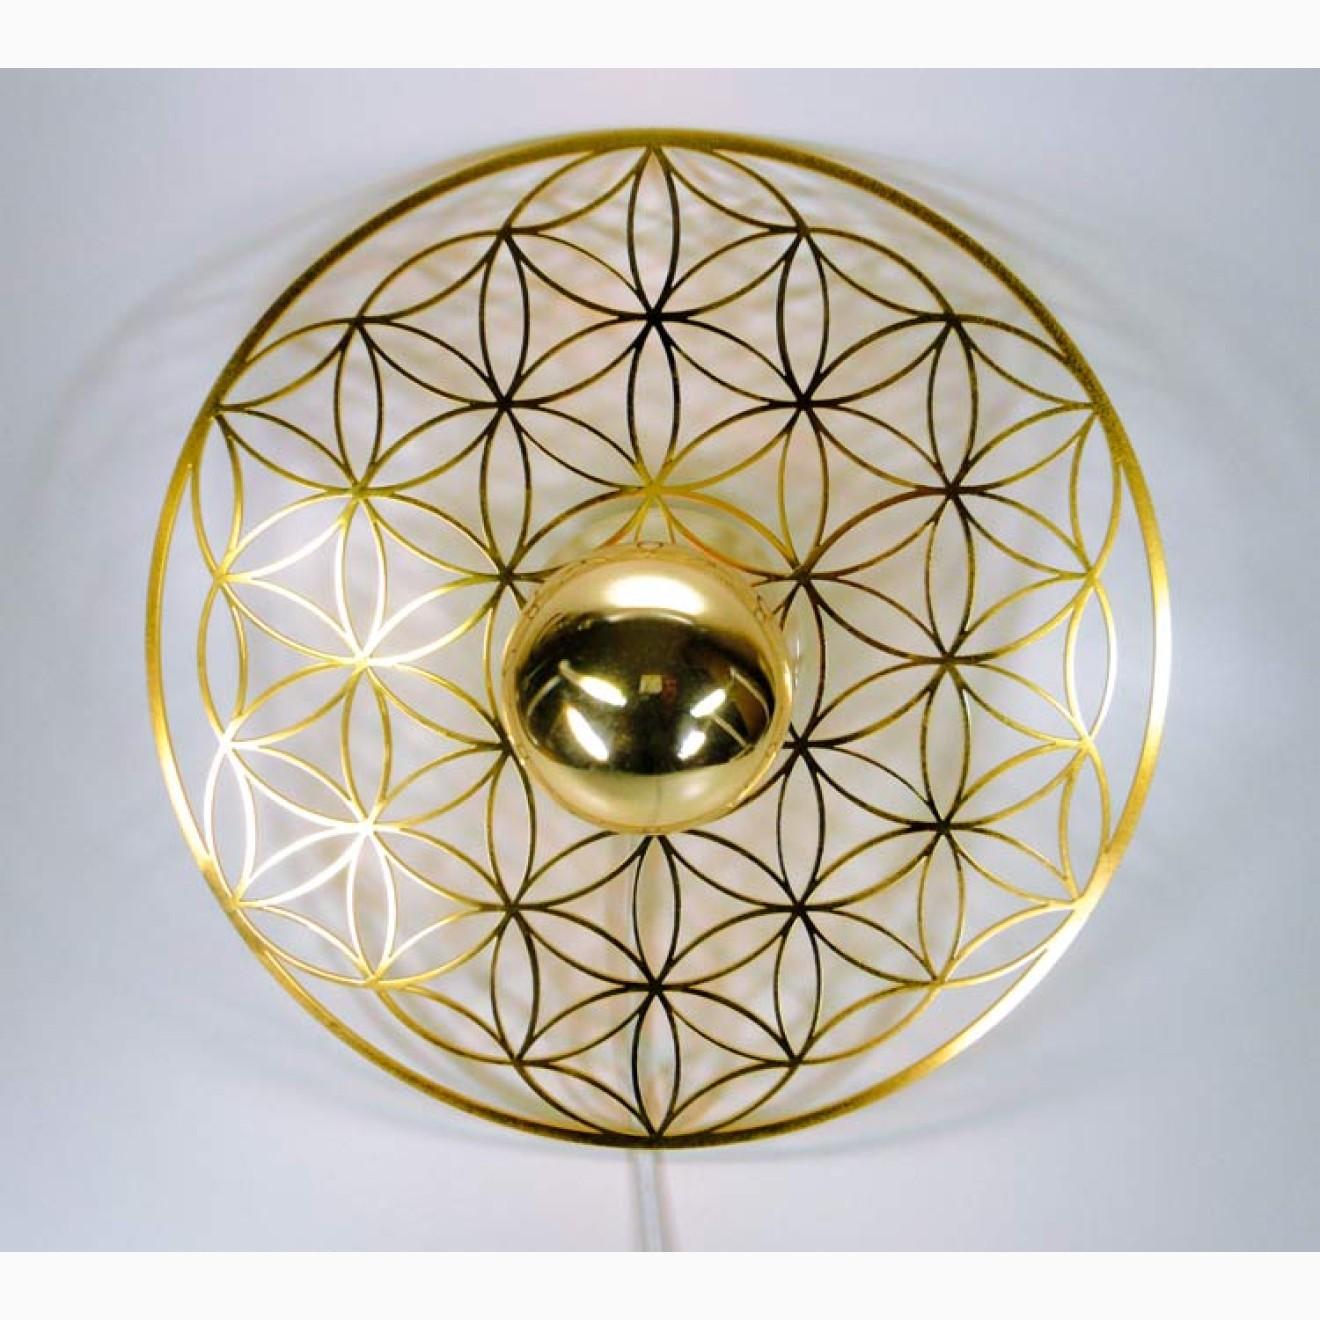 tao light wandleuchte goldene lebensblume mit dimmer. Black Bedroom Furniture Sets. Home Design Ideas